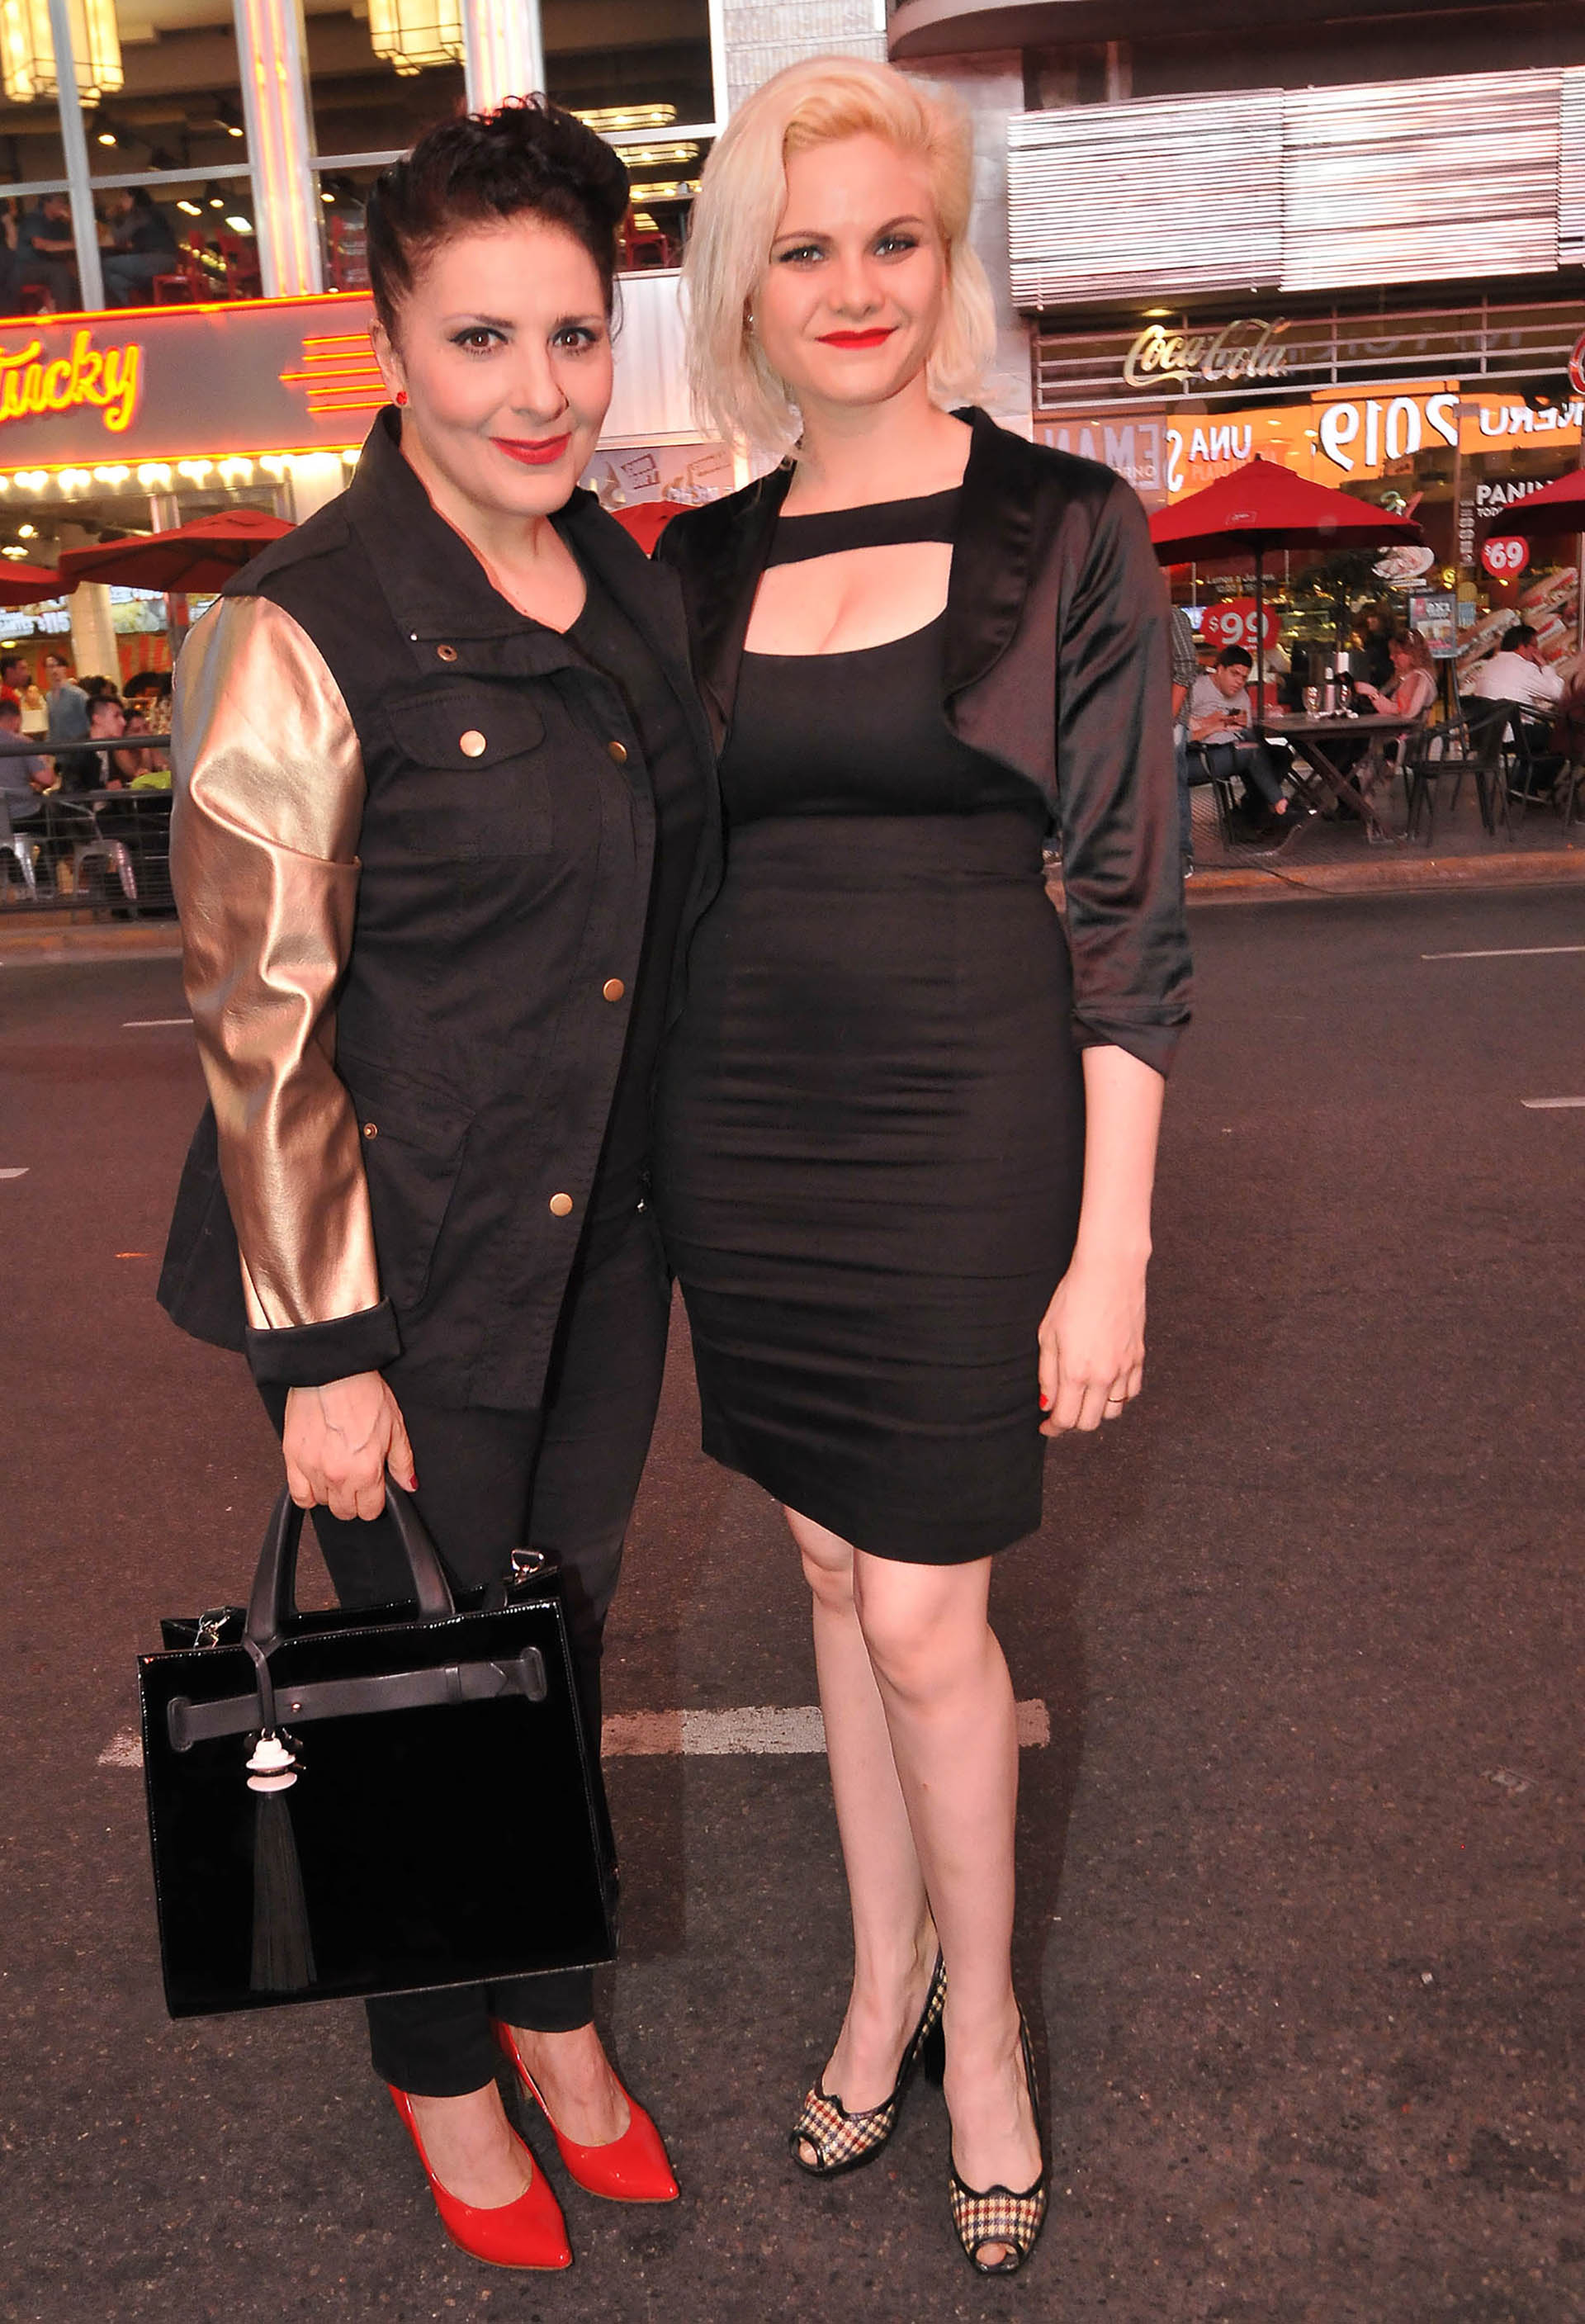 Karina K y Cynthia Manzi